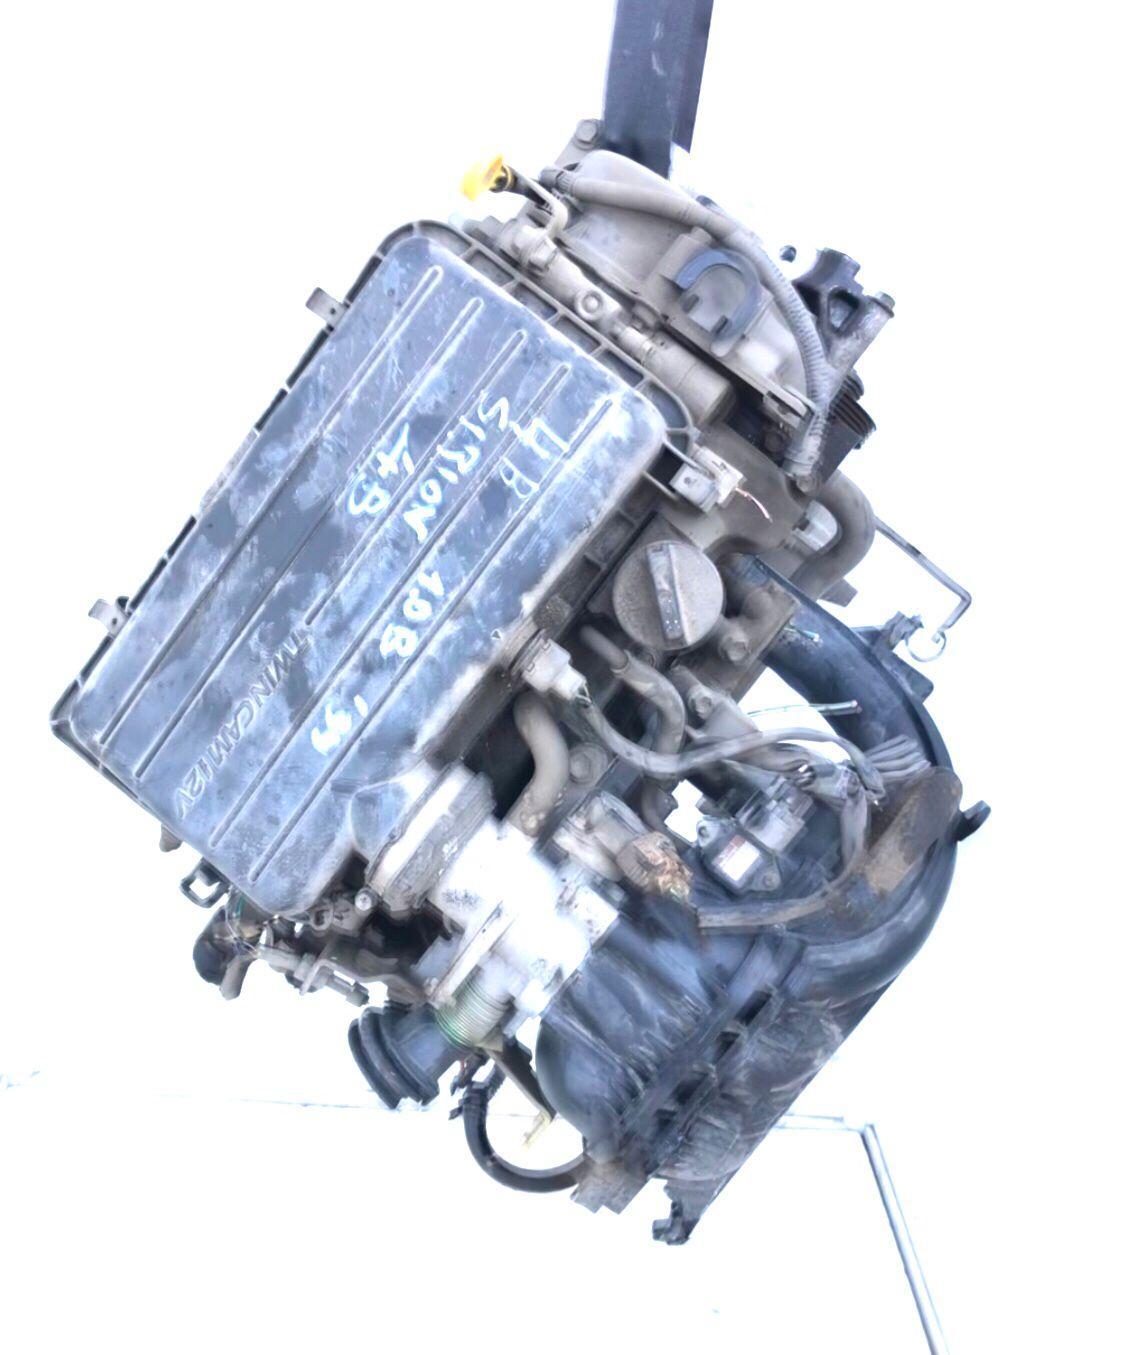 MOTORE COMPLETO DAIHATSU Sirion 1° Serie 1000 Benzina EJ 147000 Km (2001) RICAMBI USATI